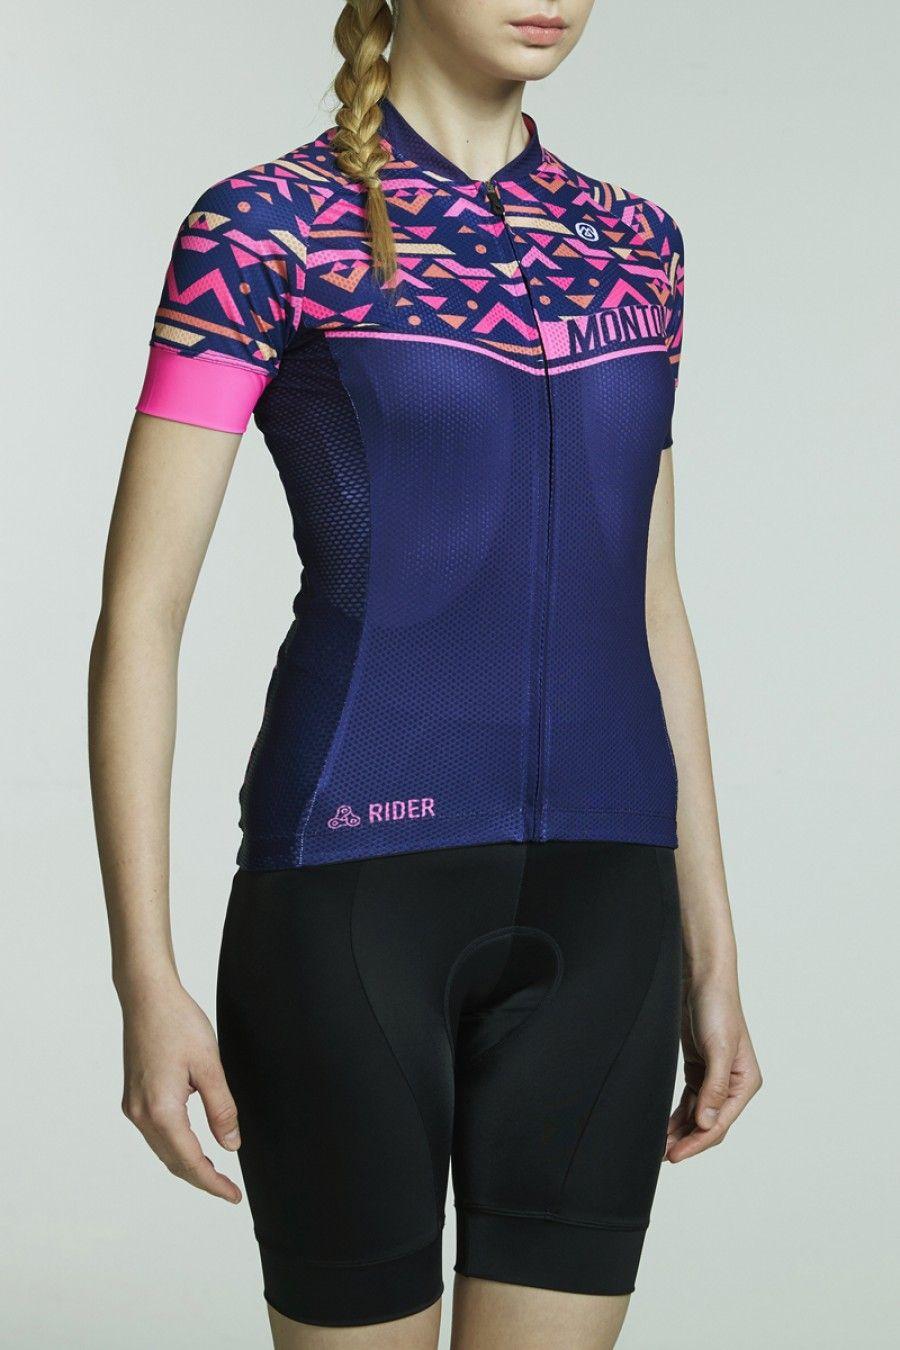 womens cycling jersey sale Women's cycling jersey